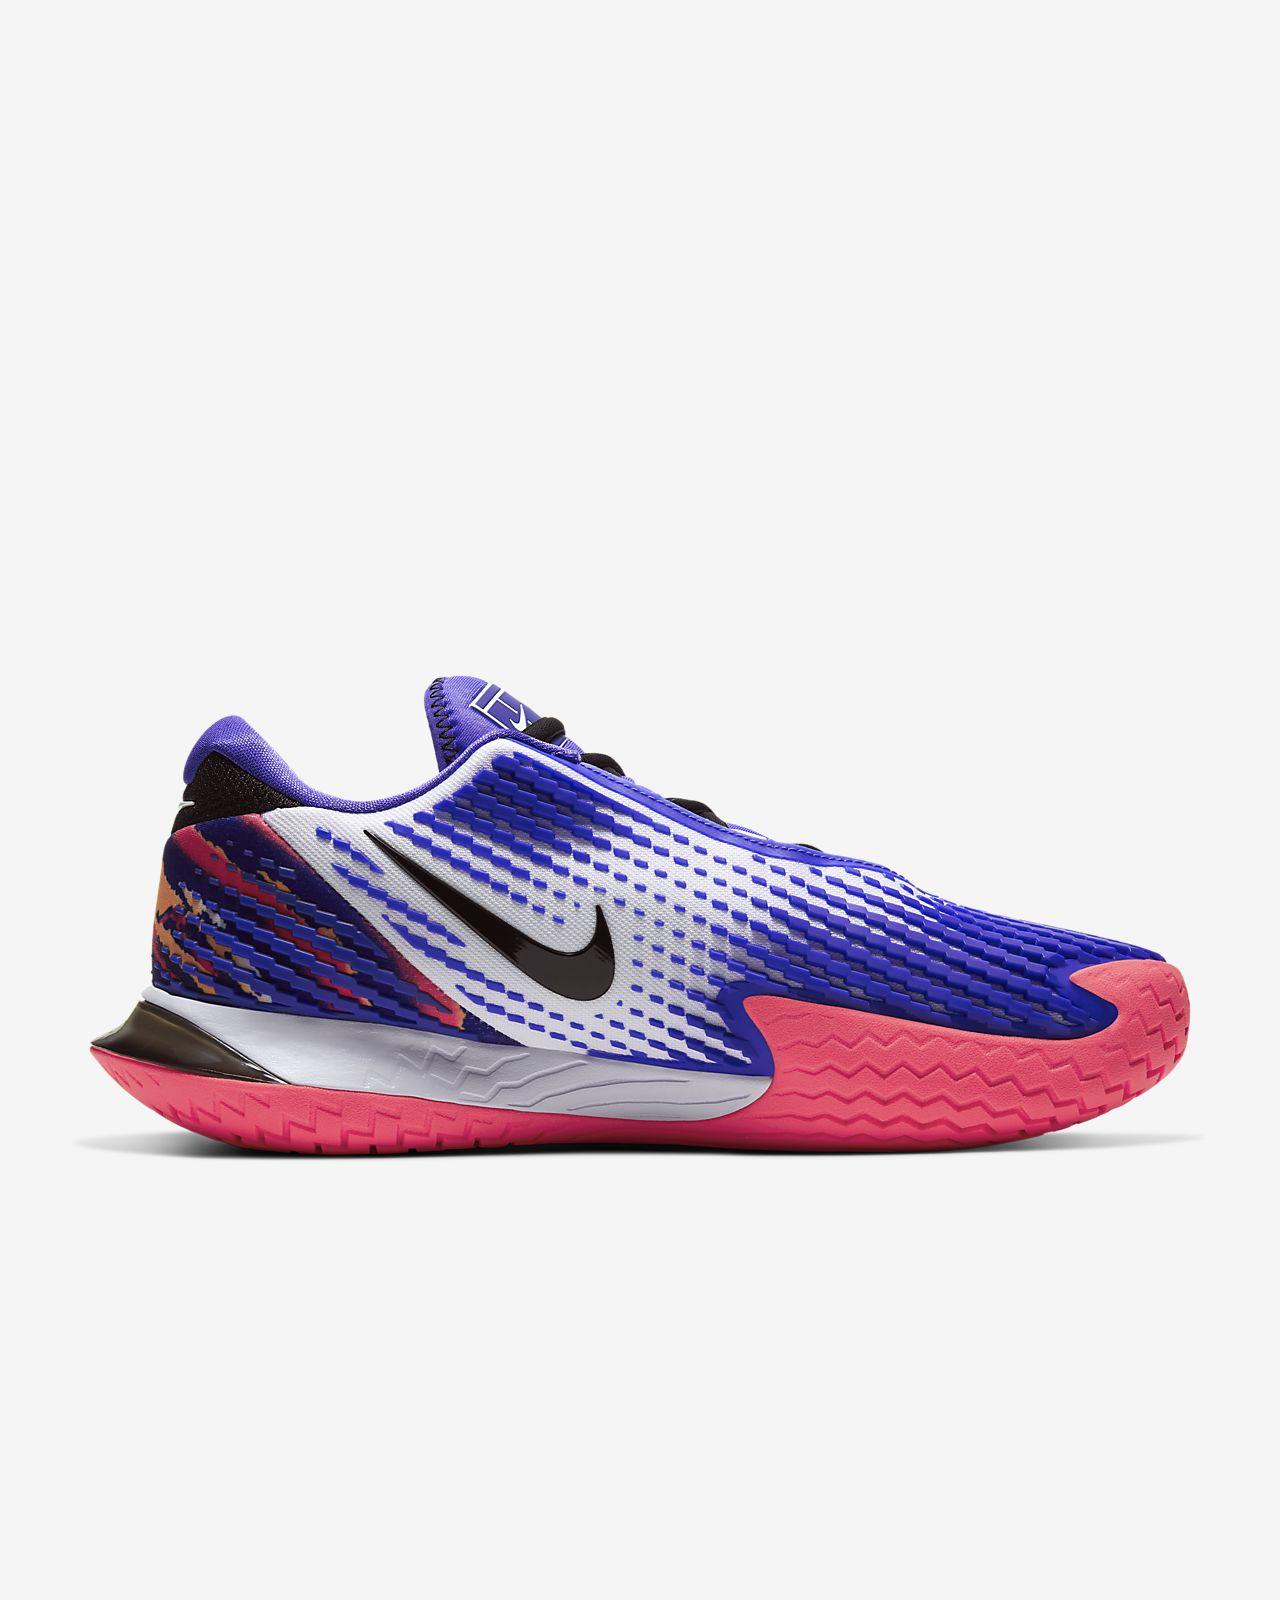 Einzigartig Nike Schuhe Sale: NikeCourt Air Zoom Vapor X